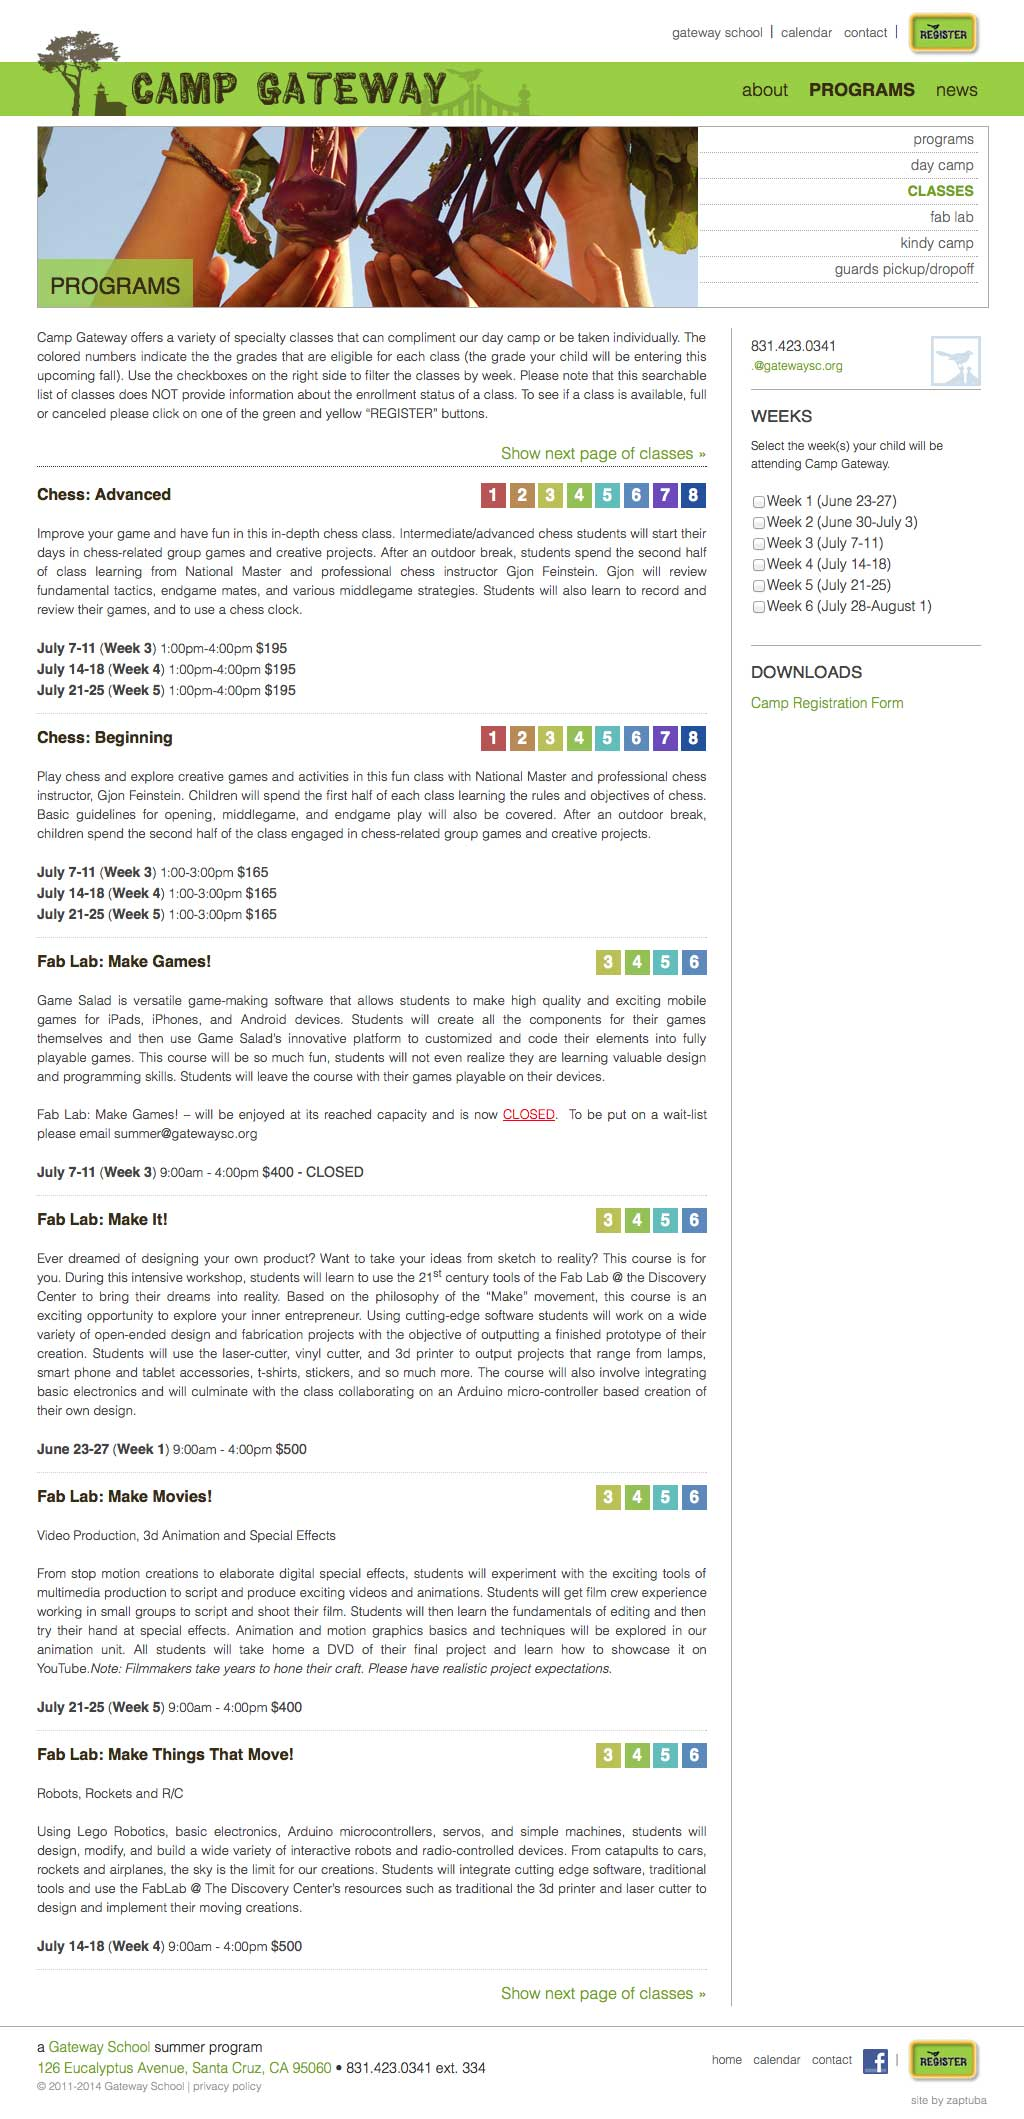 Camp Gateway • Programs • Classes page - Website by ZapTuba